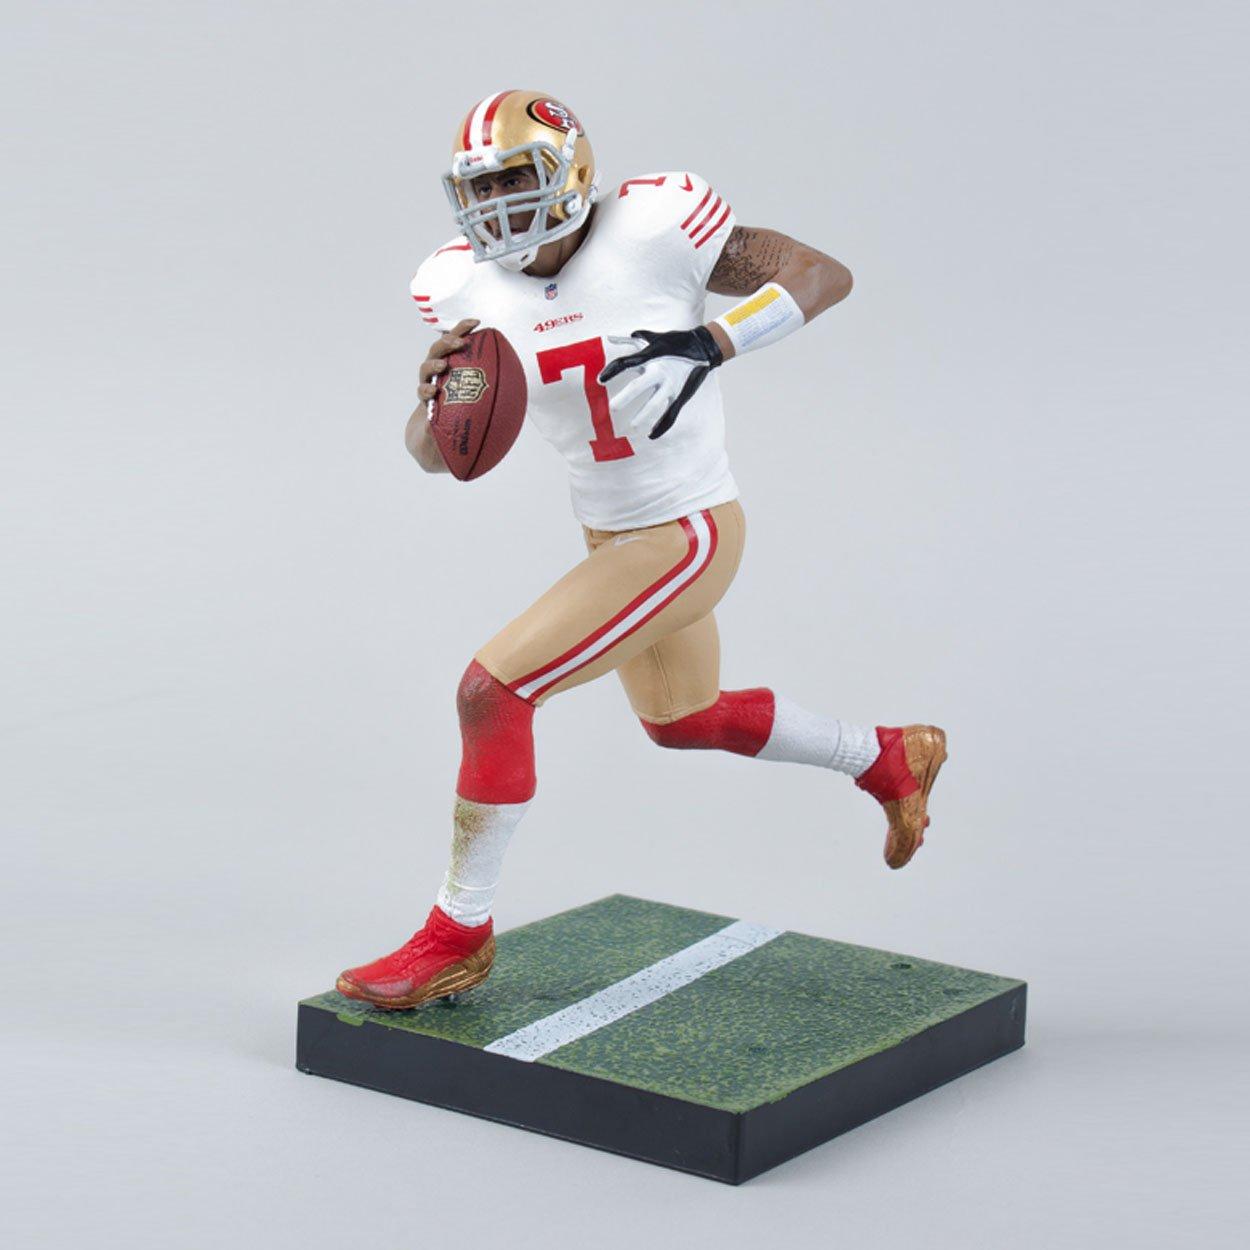 McFarlane NFL Series 33 Figure San Francisco 49Ers Colin Kaepernick McFarlane Toys 75636-4